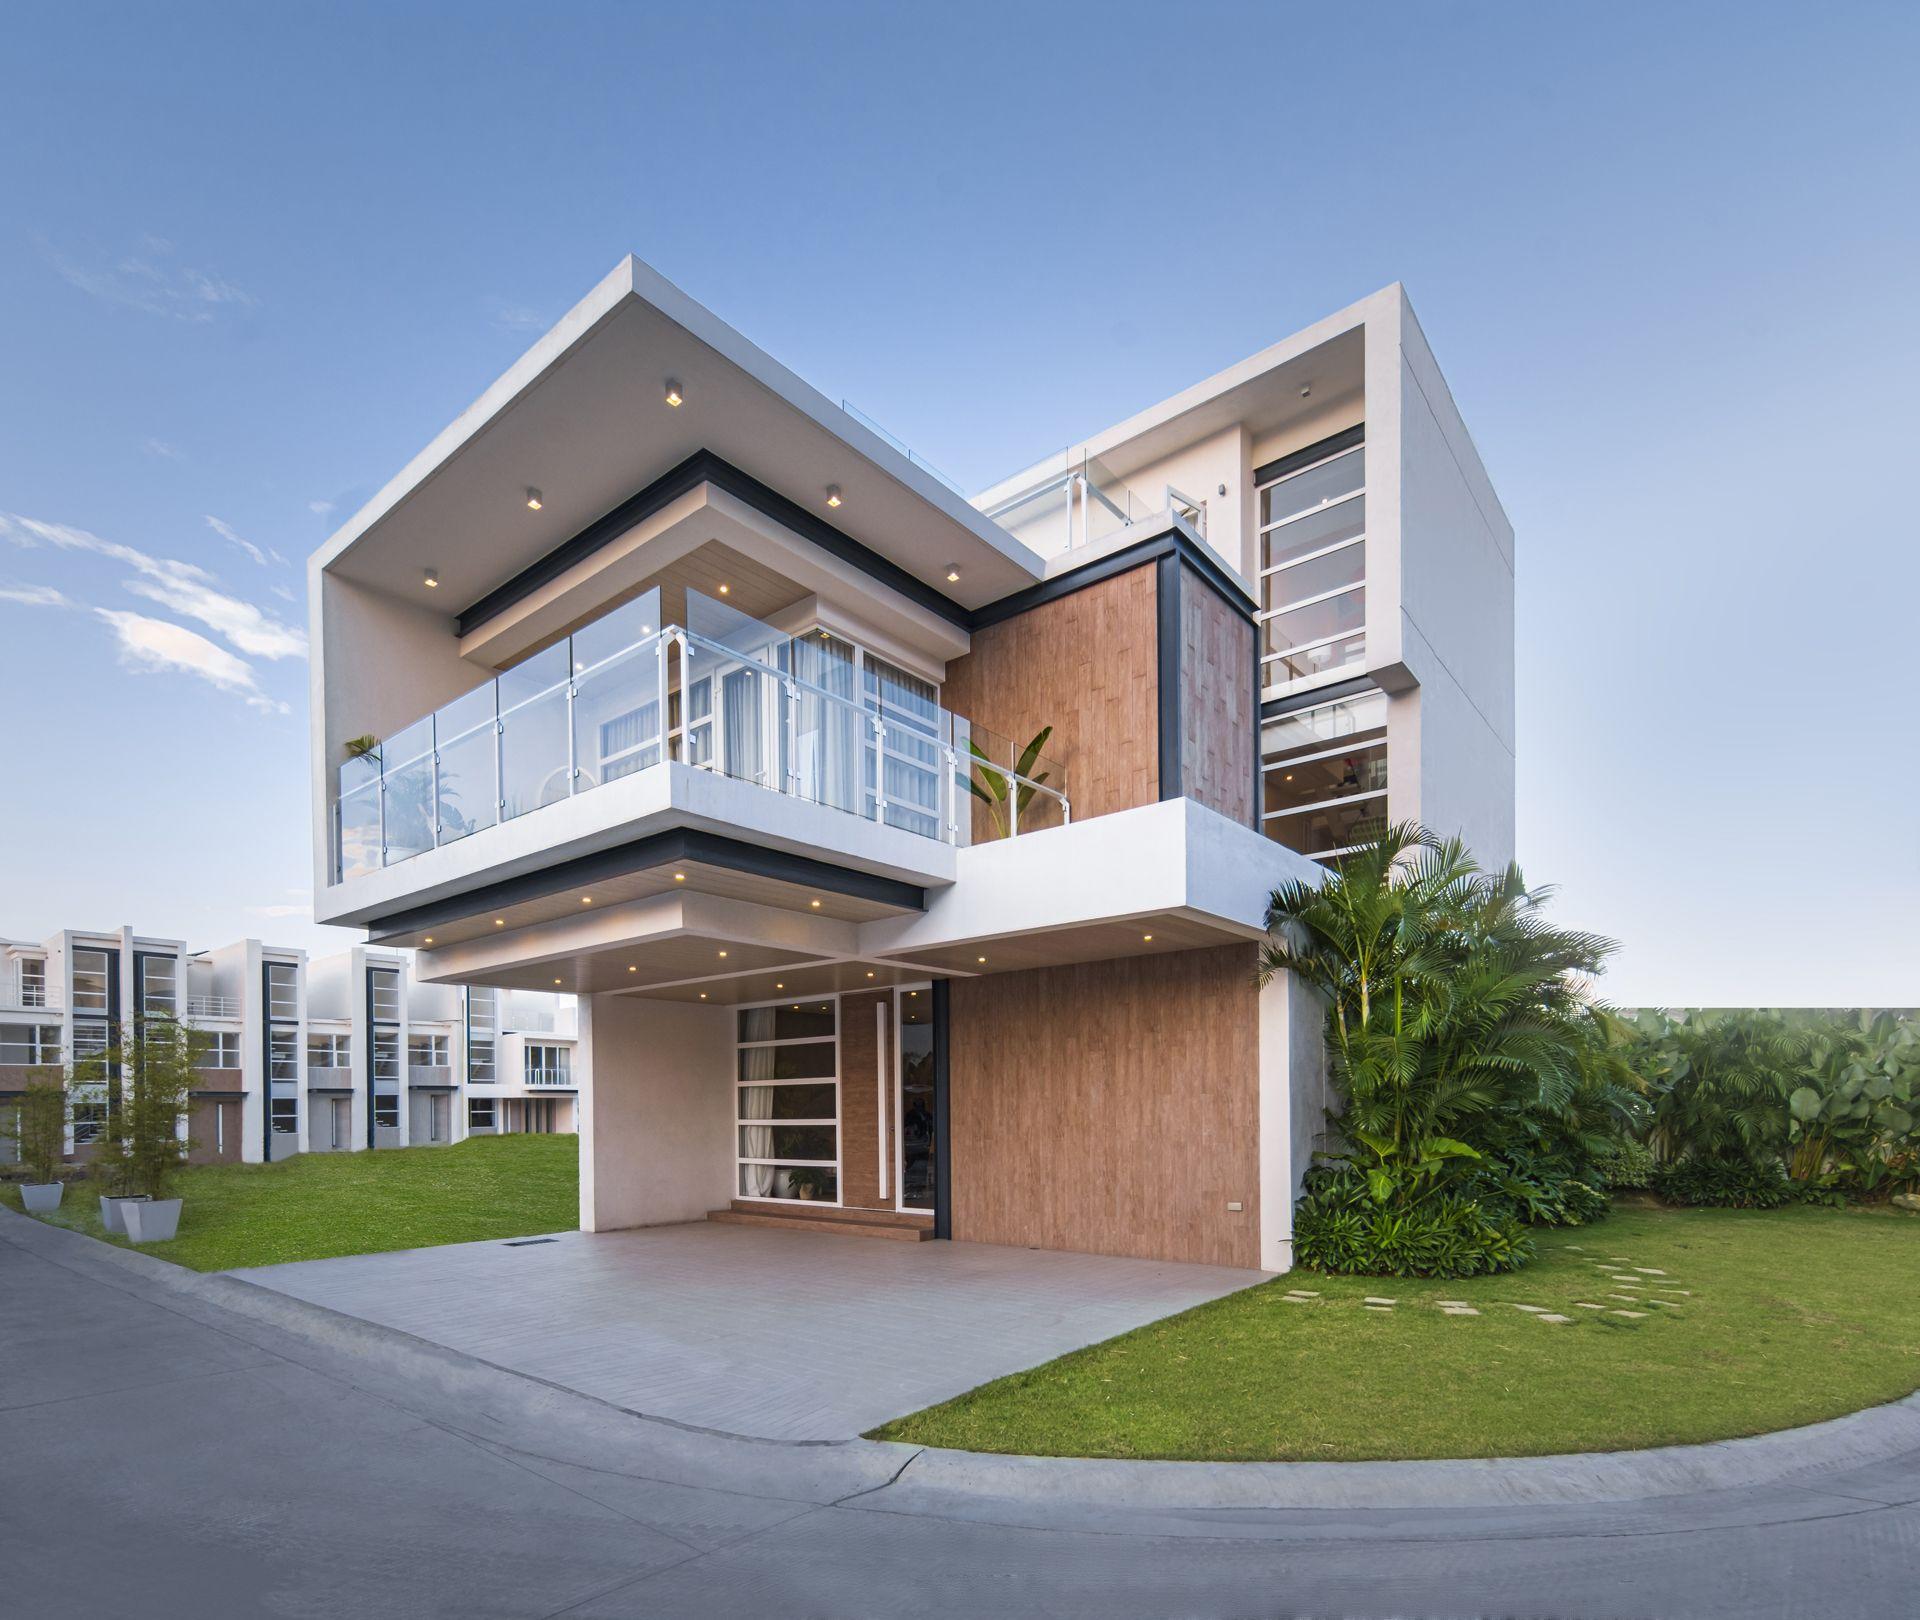 KIARA MODEL HOUSE